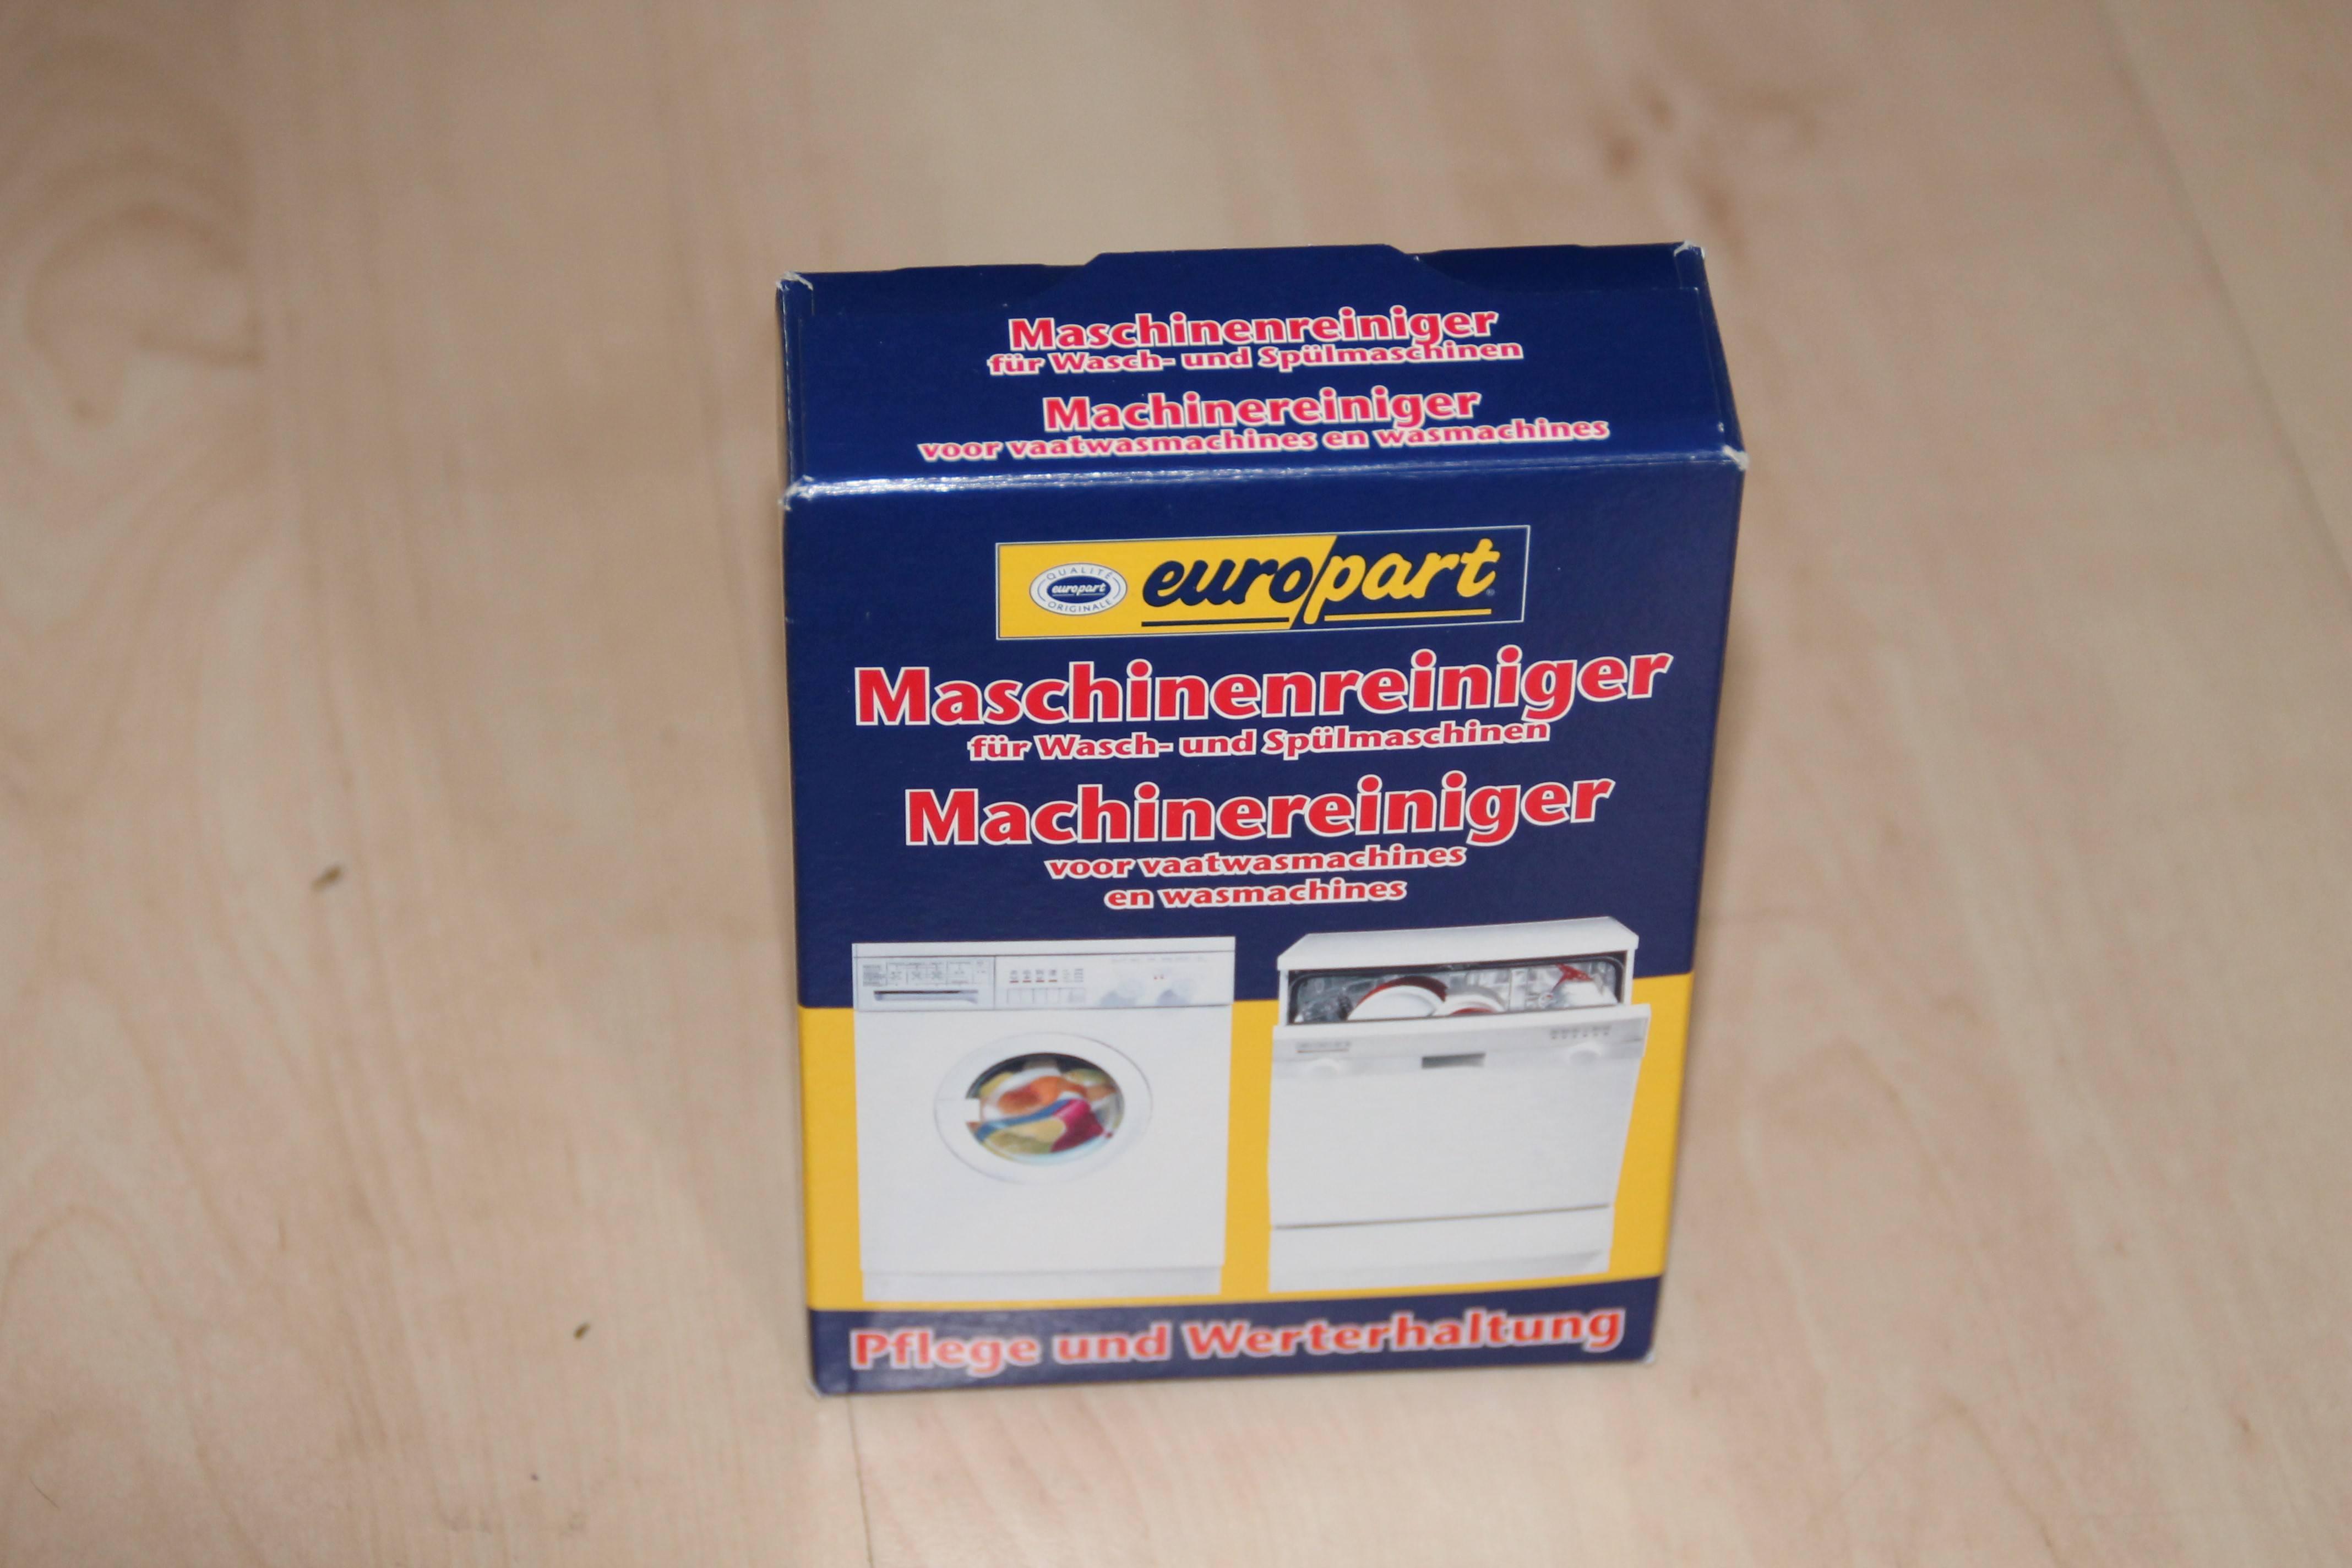 Waschmaschinenreiniger Europart IV